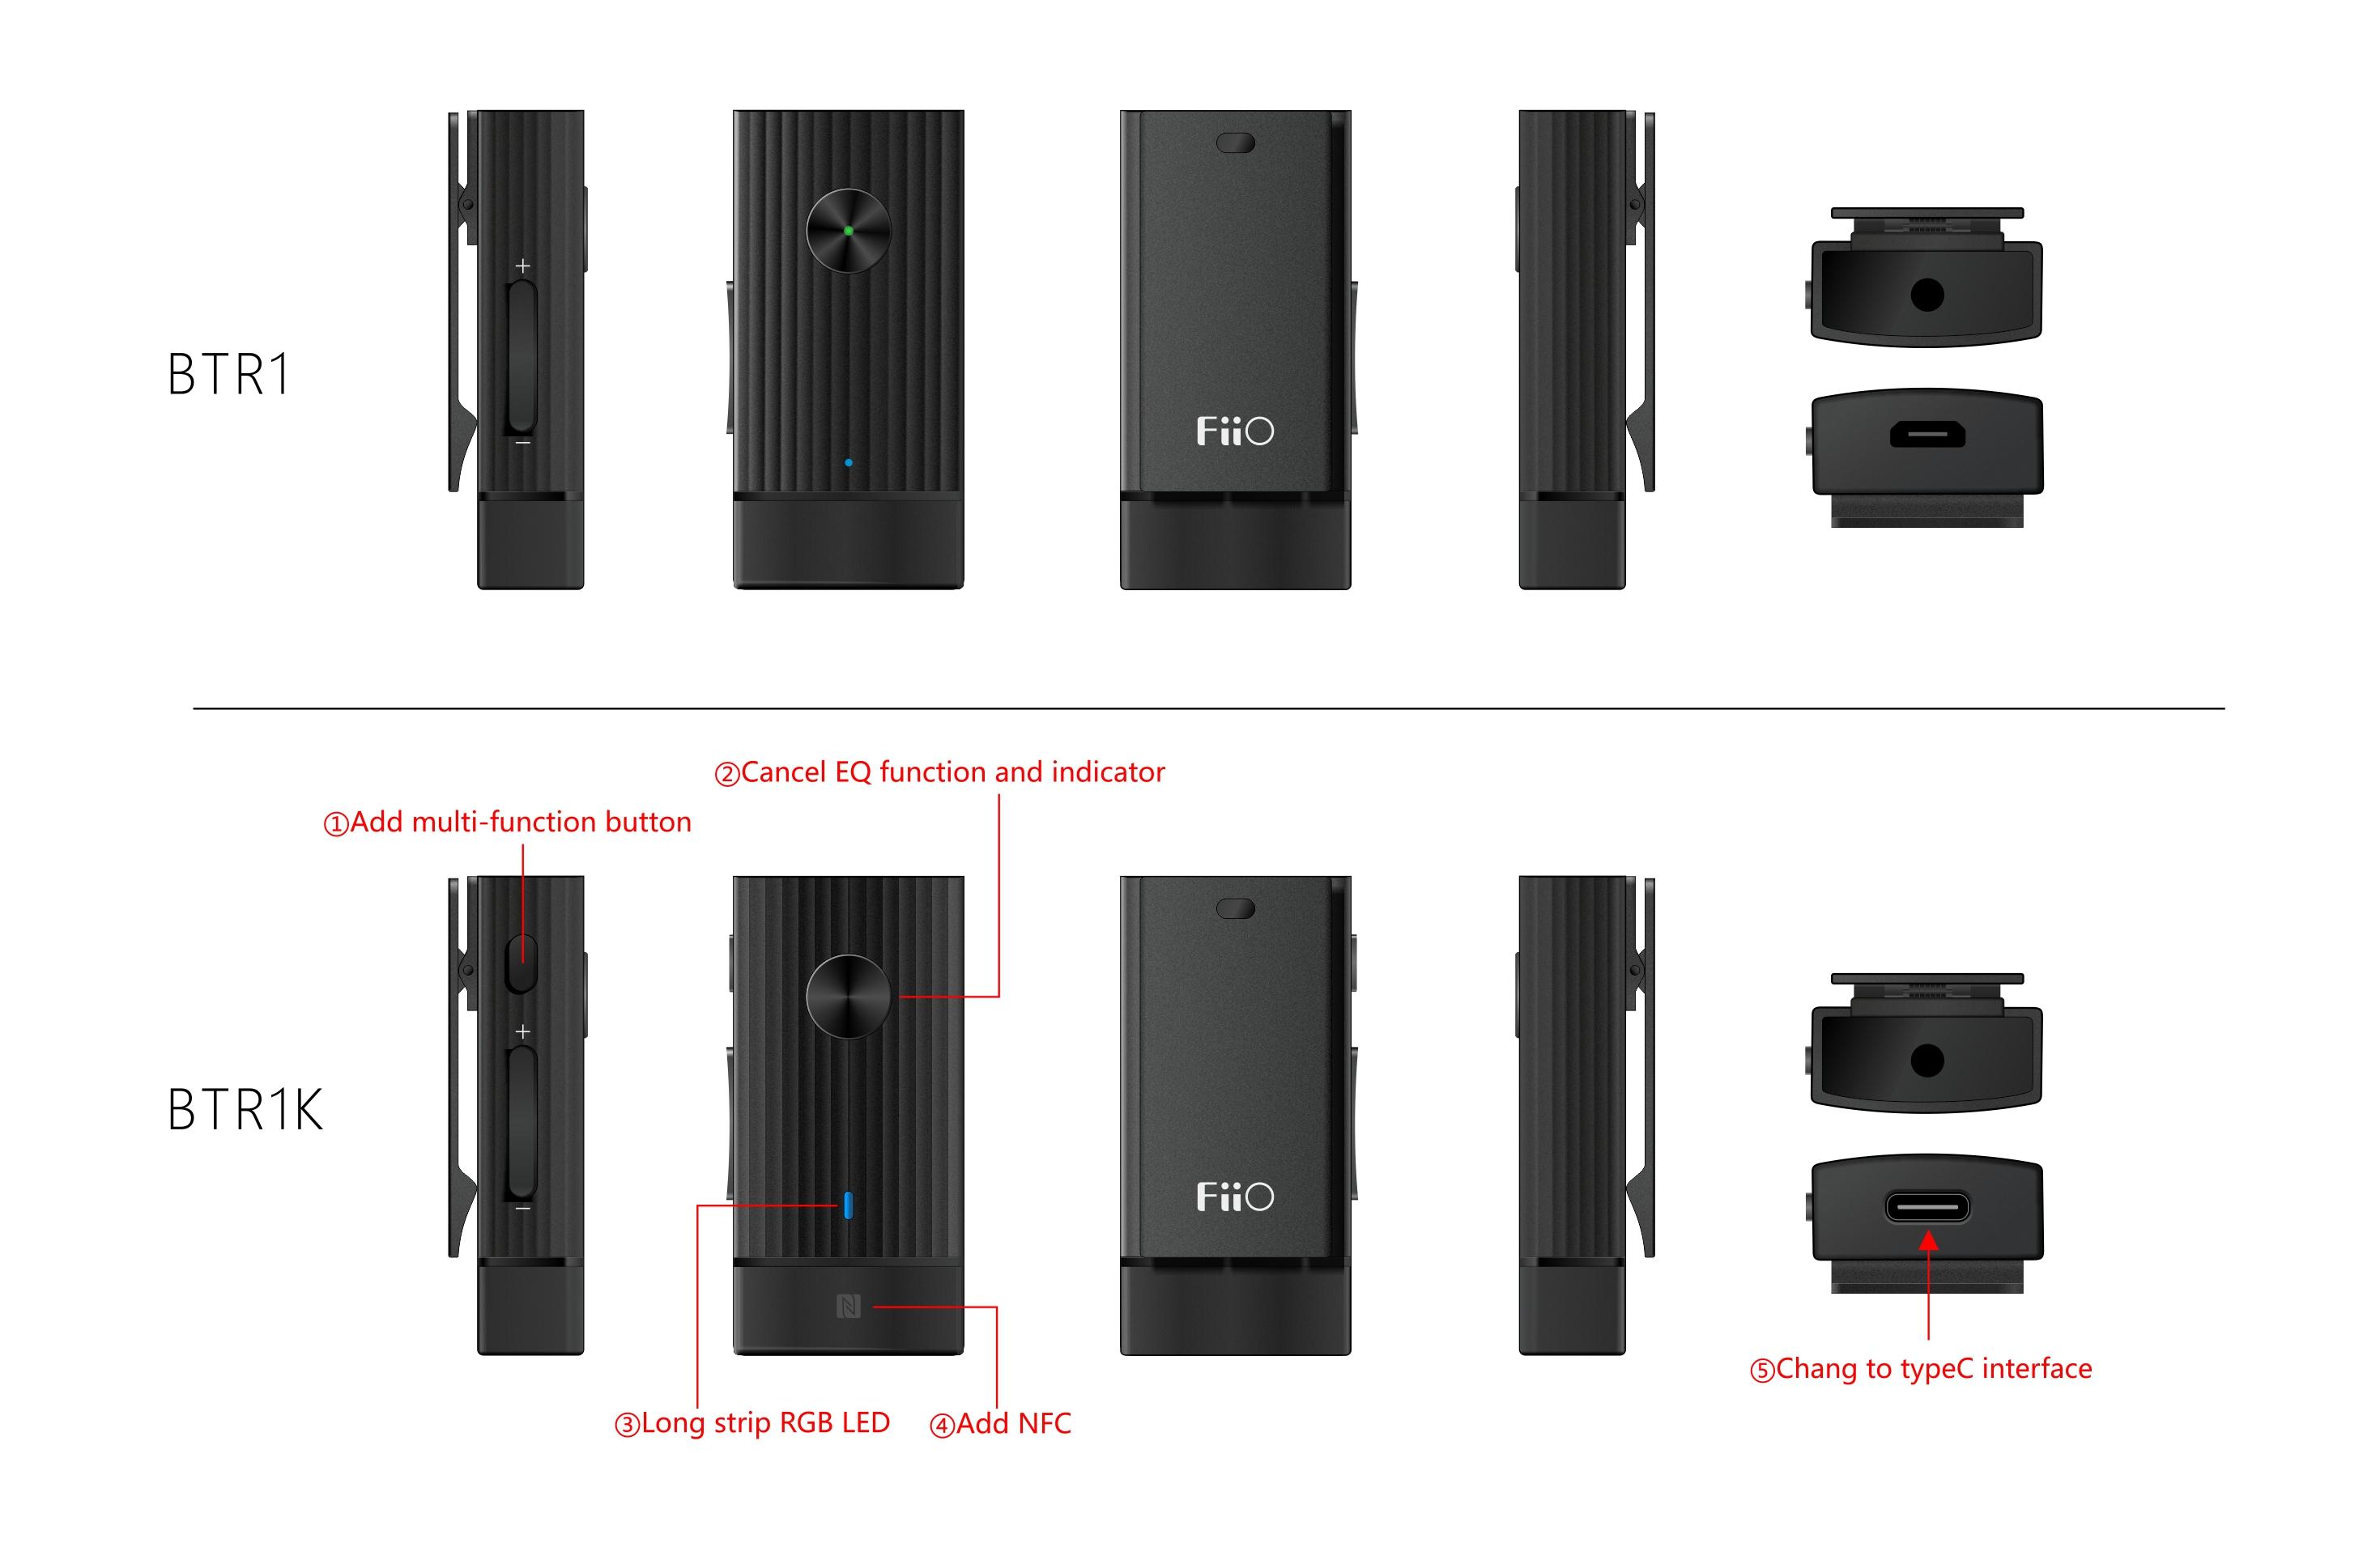 2c9847644aa FiiO's Upgraded Bluetooth Amplifier BTR1K: Qualcomm QCC 3005 BT chip ...